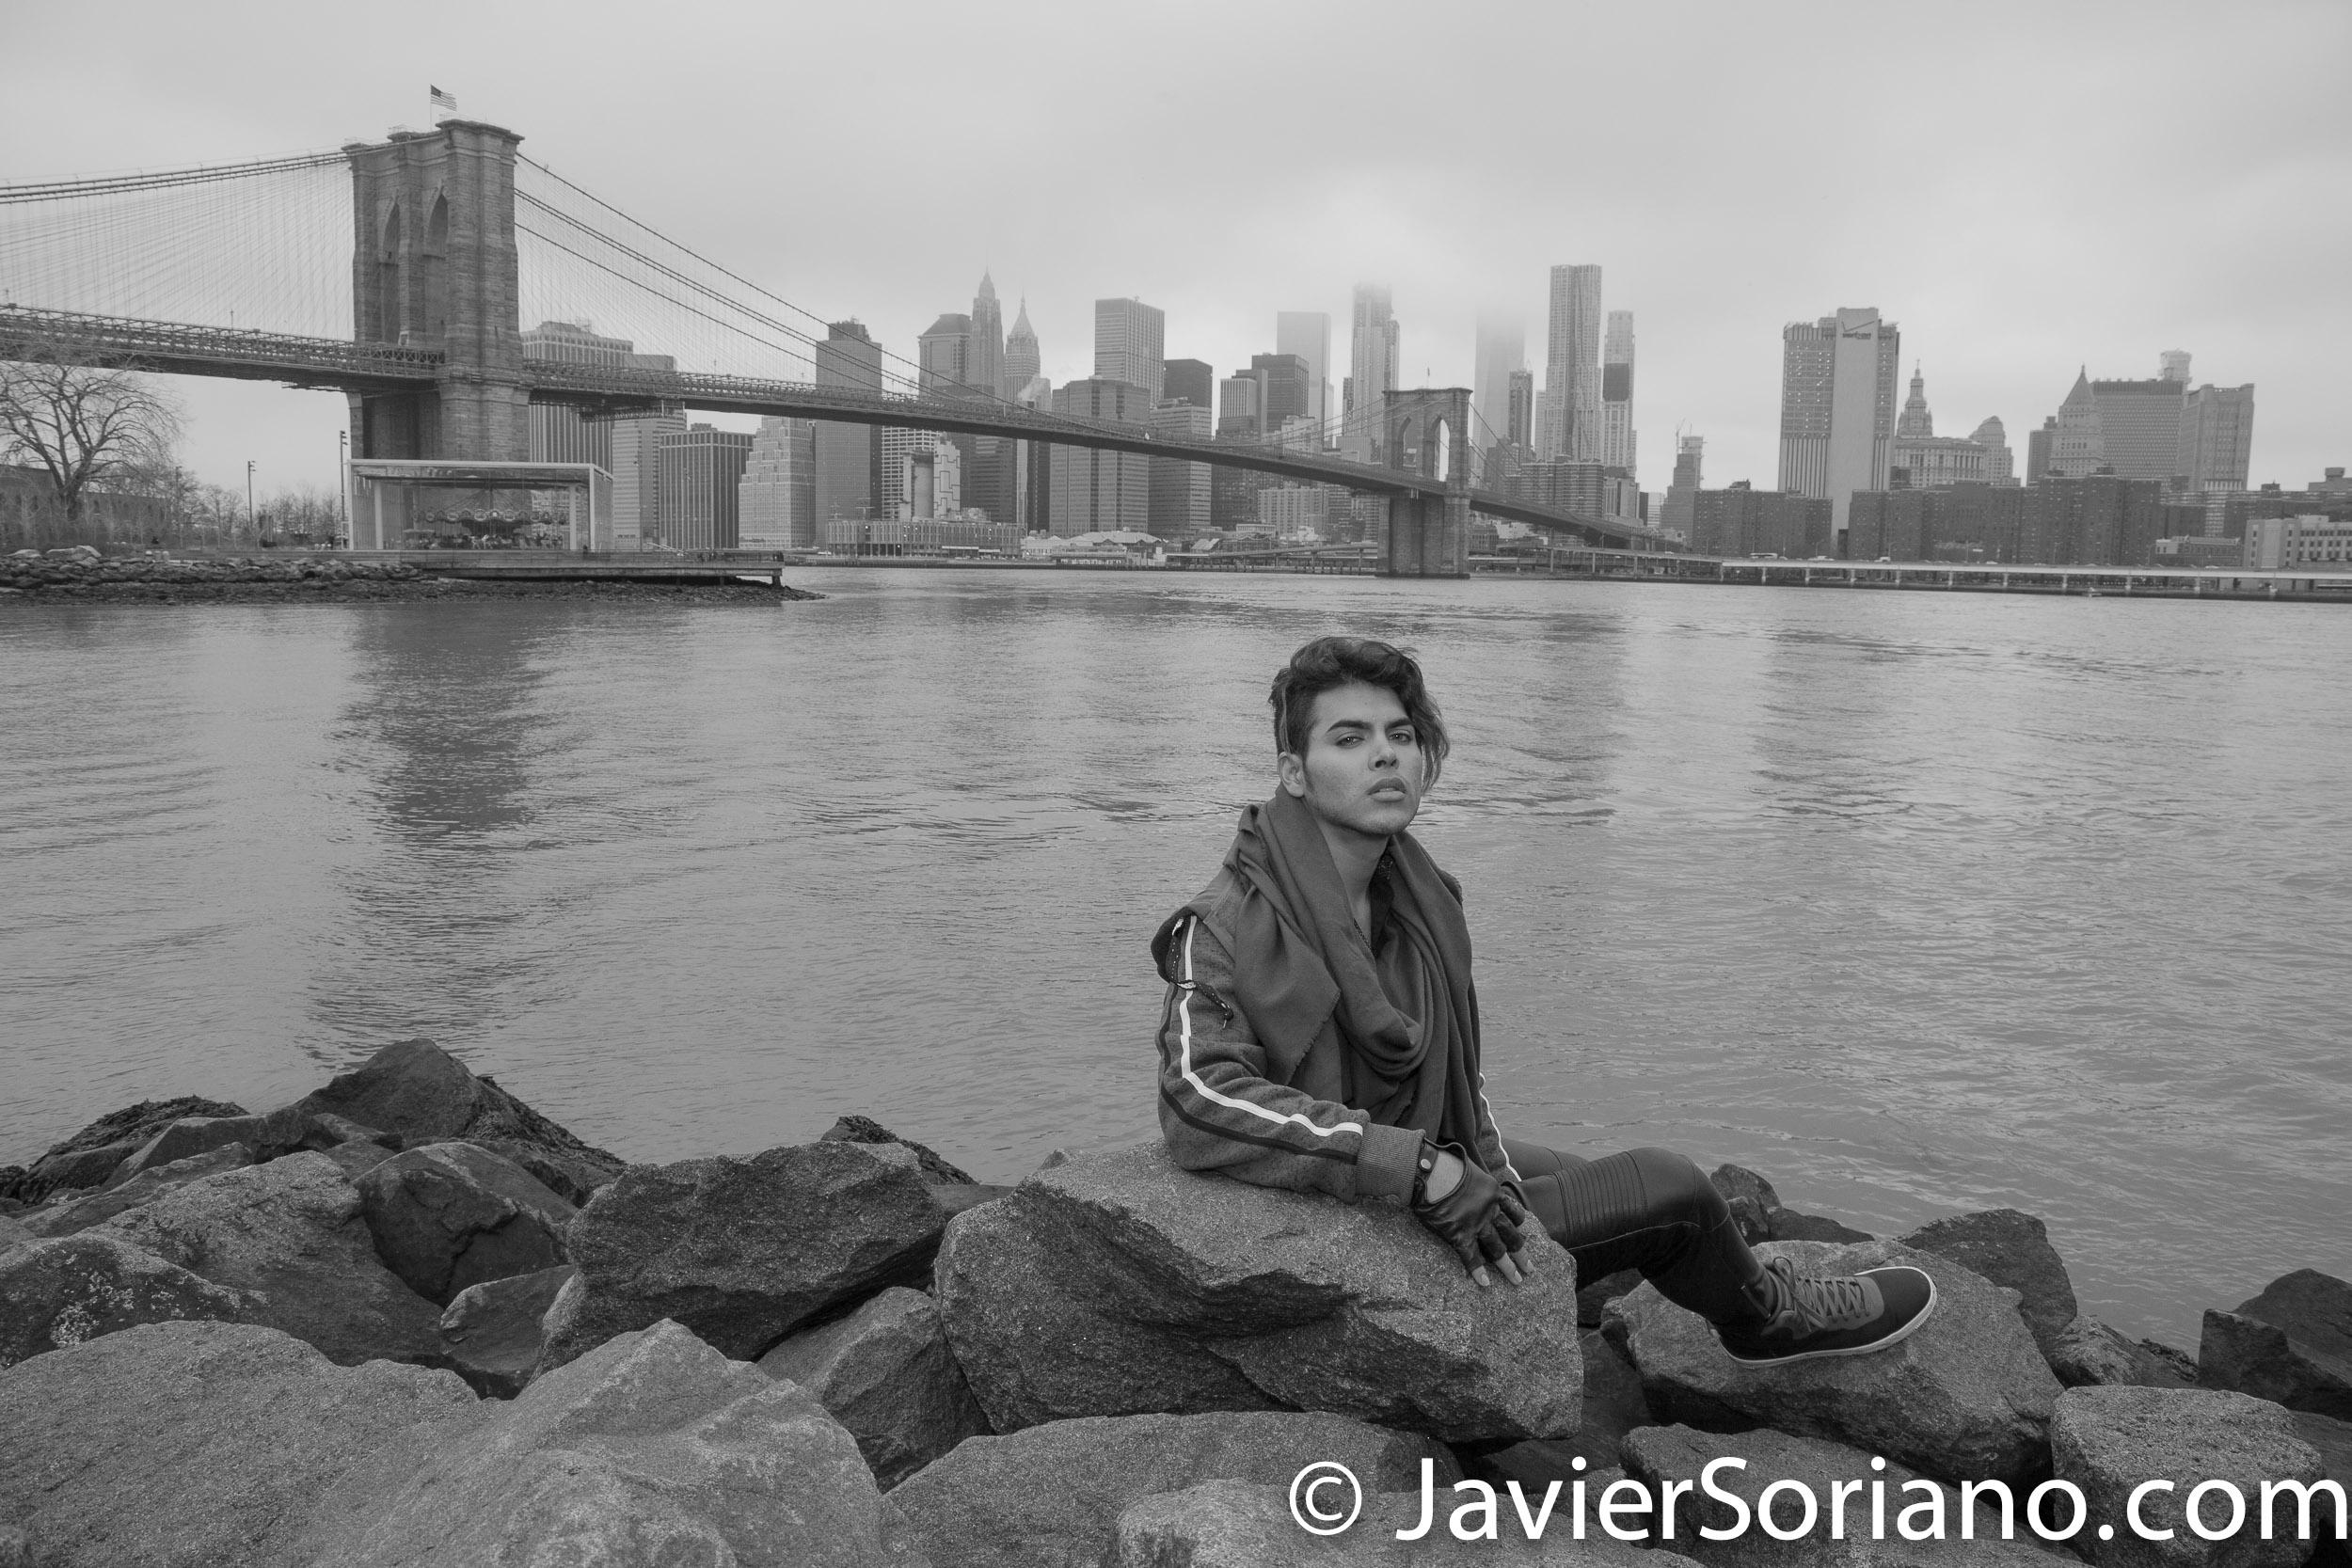 Latino man in Brooklyn Bridge Park. The Brooklyn Bridge on the background. Photo by Javier Soriano/www.JavierSoriano.com